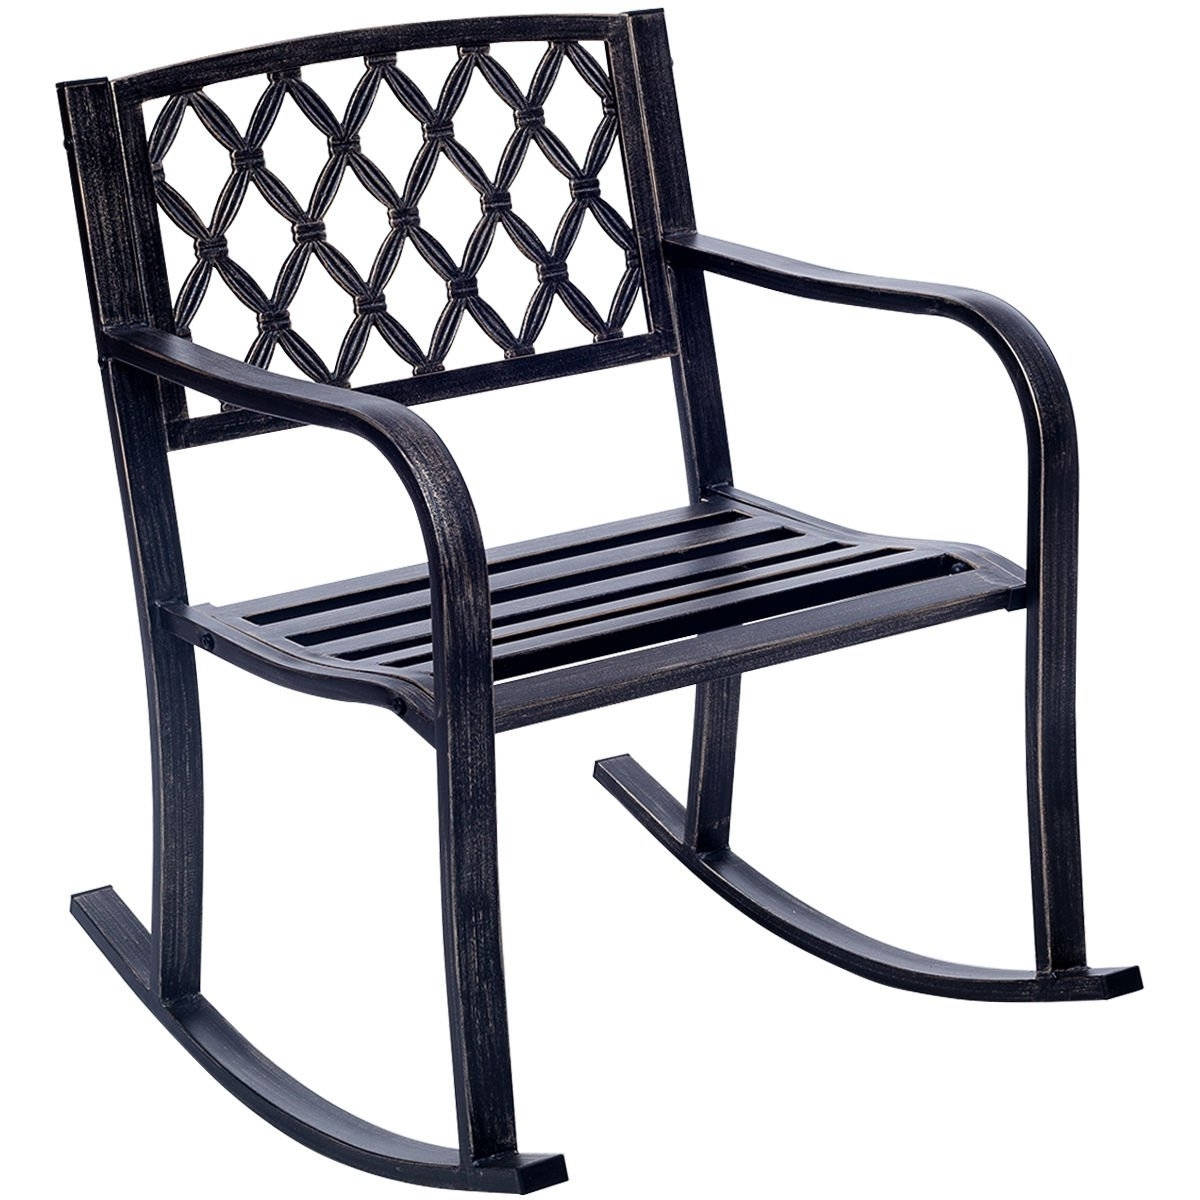 Most Popular Outdoor Patio Metal Rocking Chairs Pertaining To Giantex Patio Metal Rocking Chair Porch Seat Deck Outdoor Backyard (View 5 of 15)